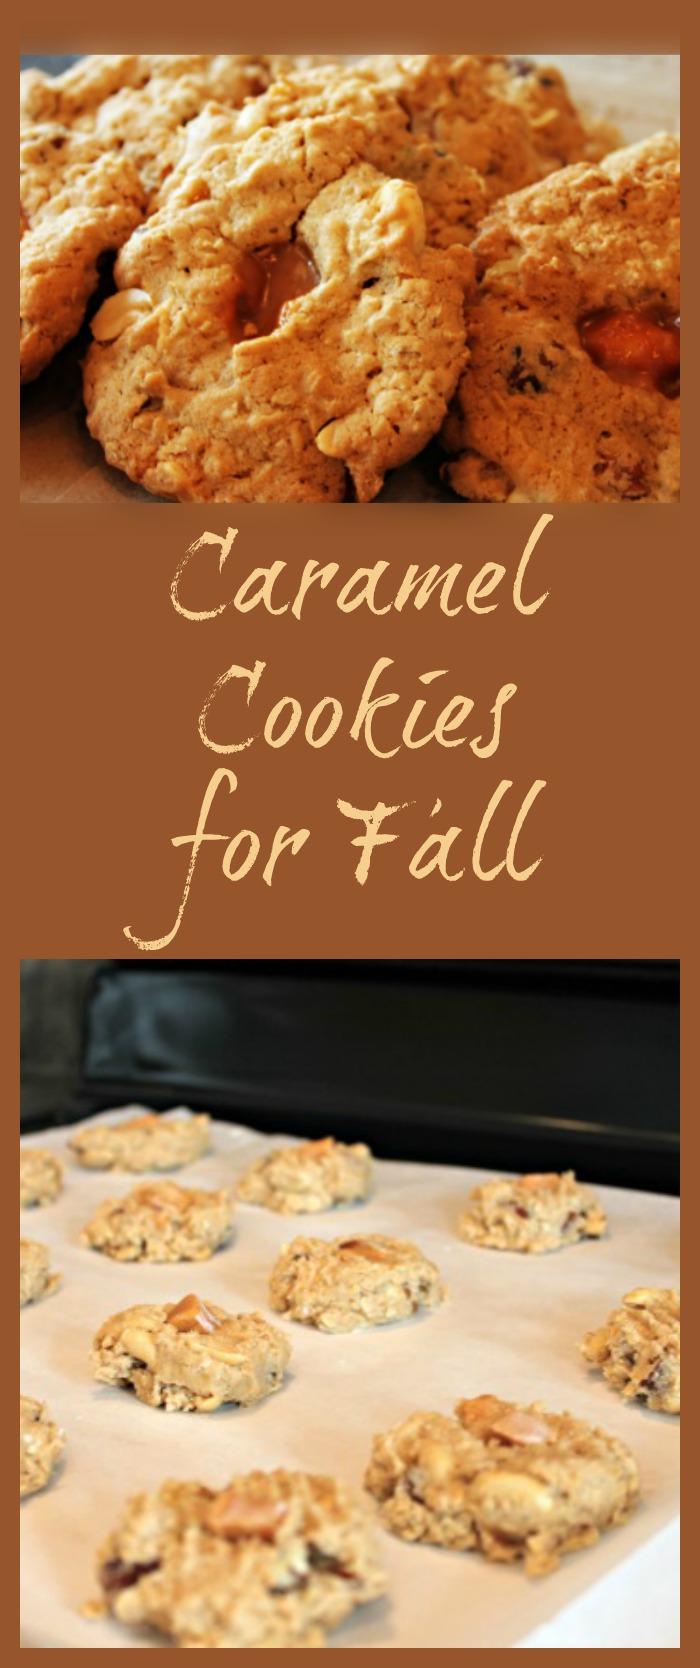 Caramel, Cookies, Baking, Fall